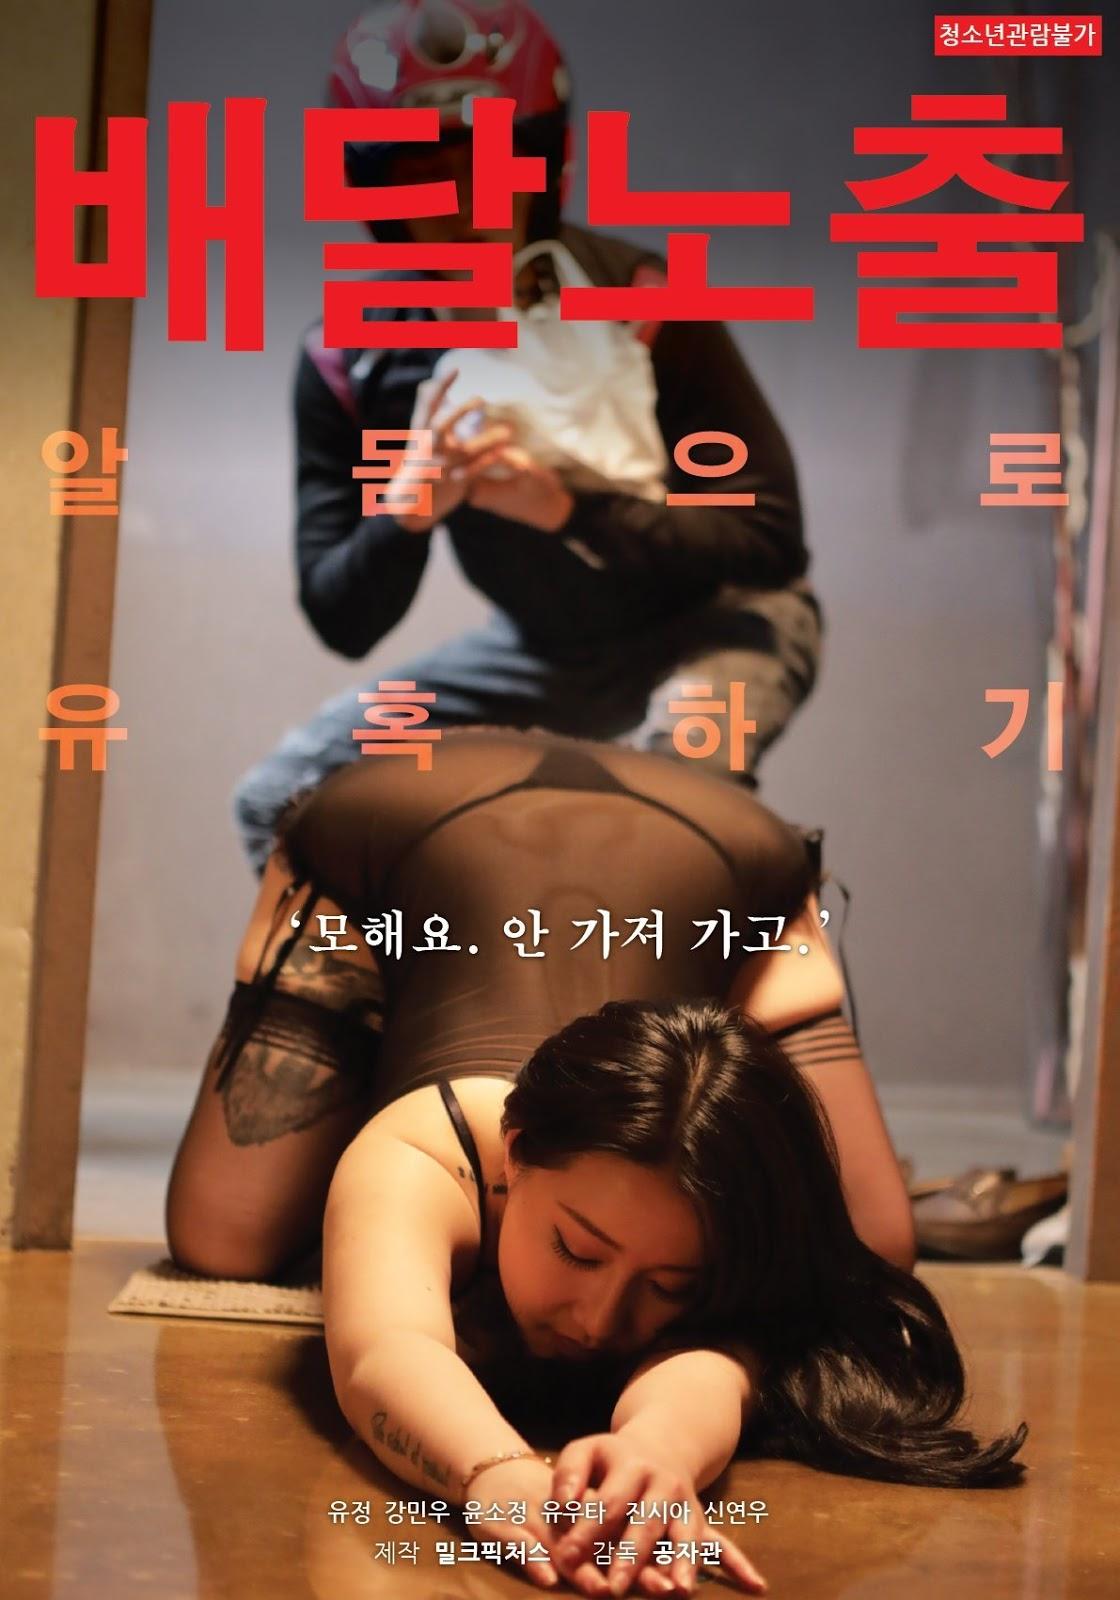 Pizza Dare 1 Full Korea 18+ Adult Movie Online Free